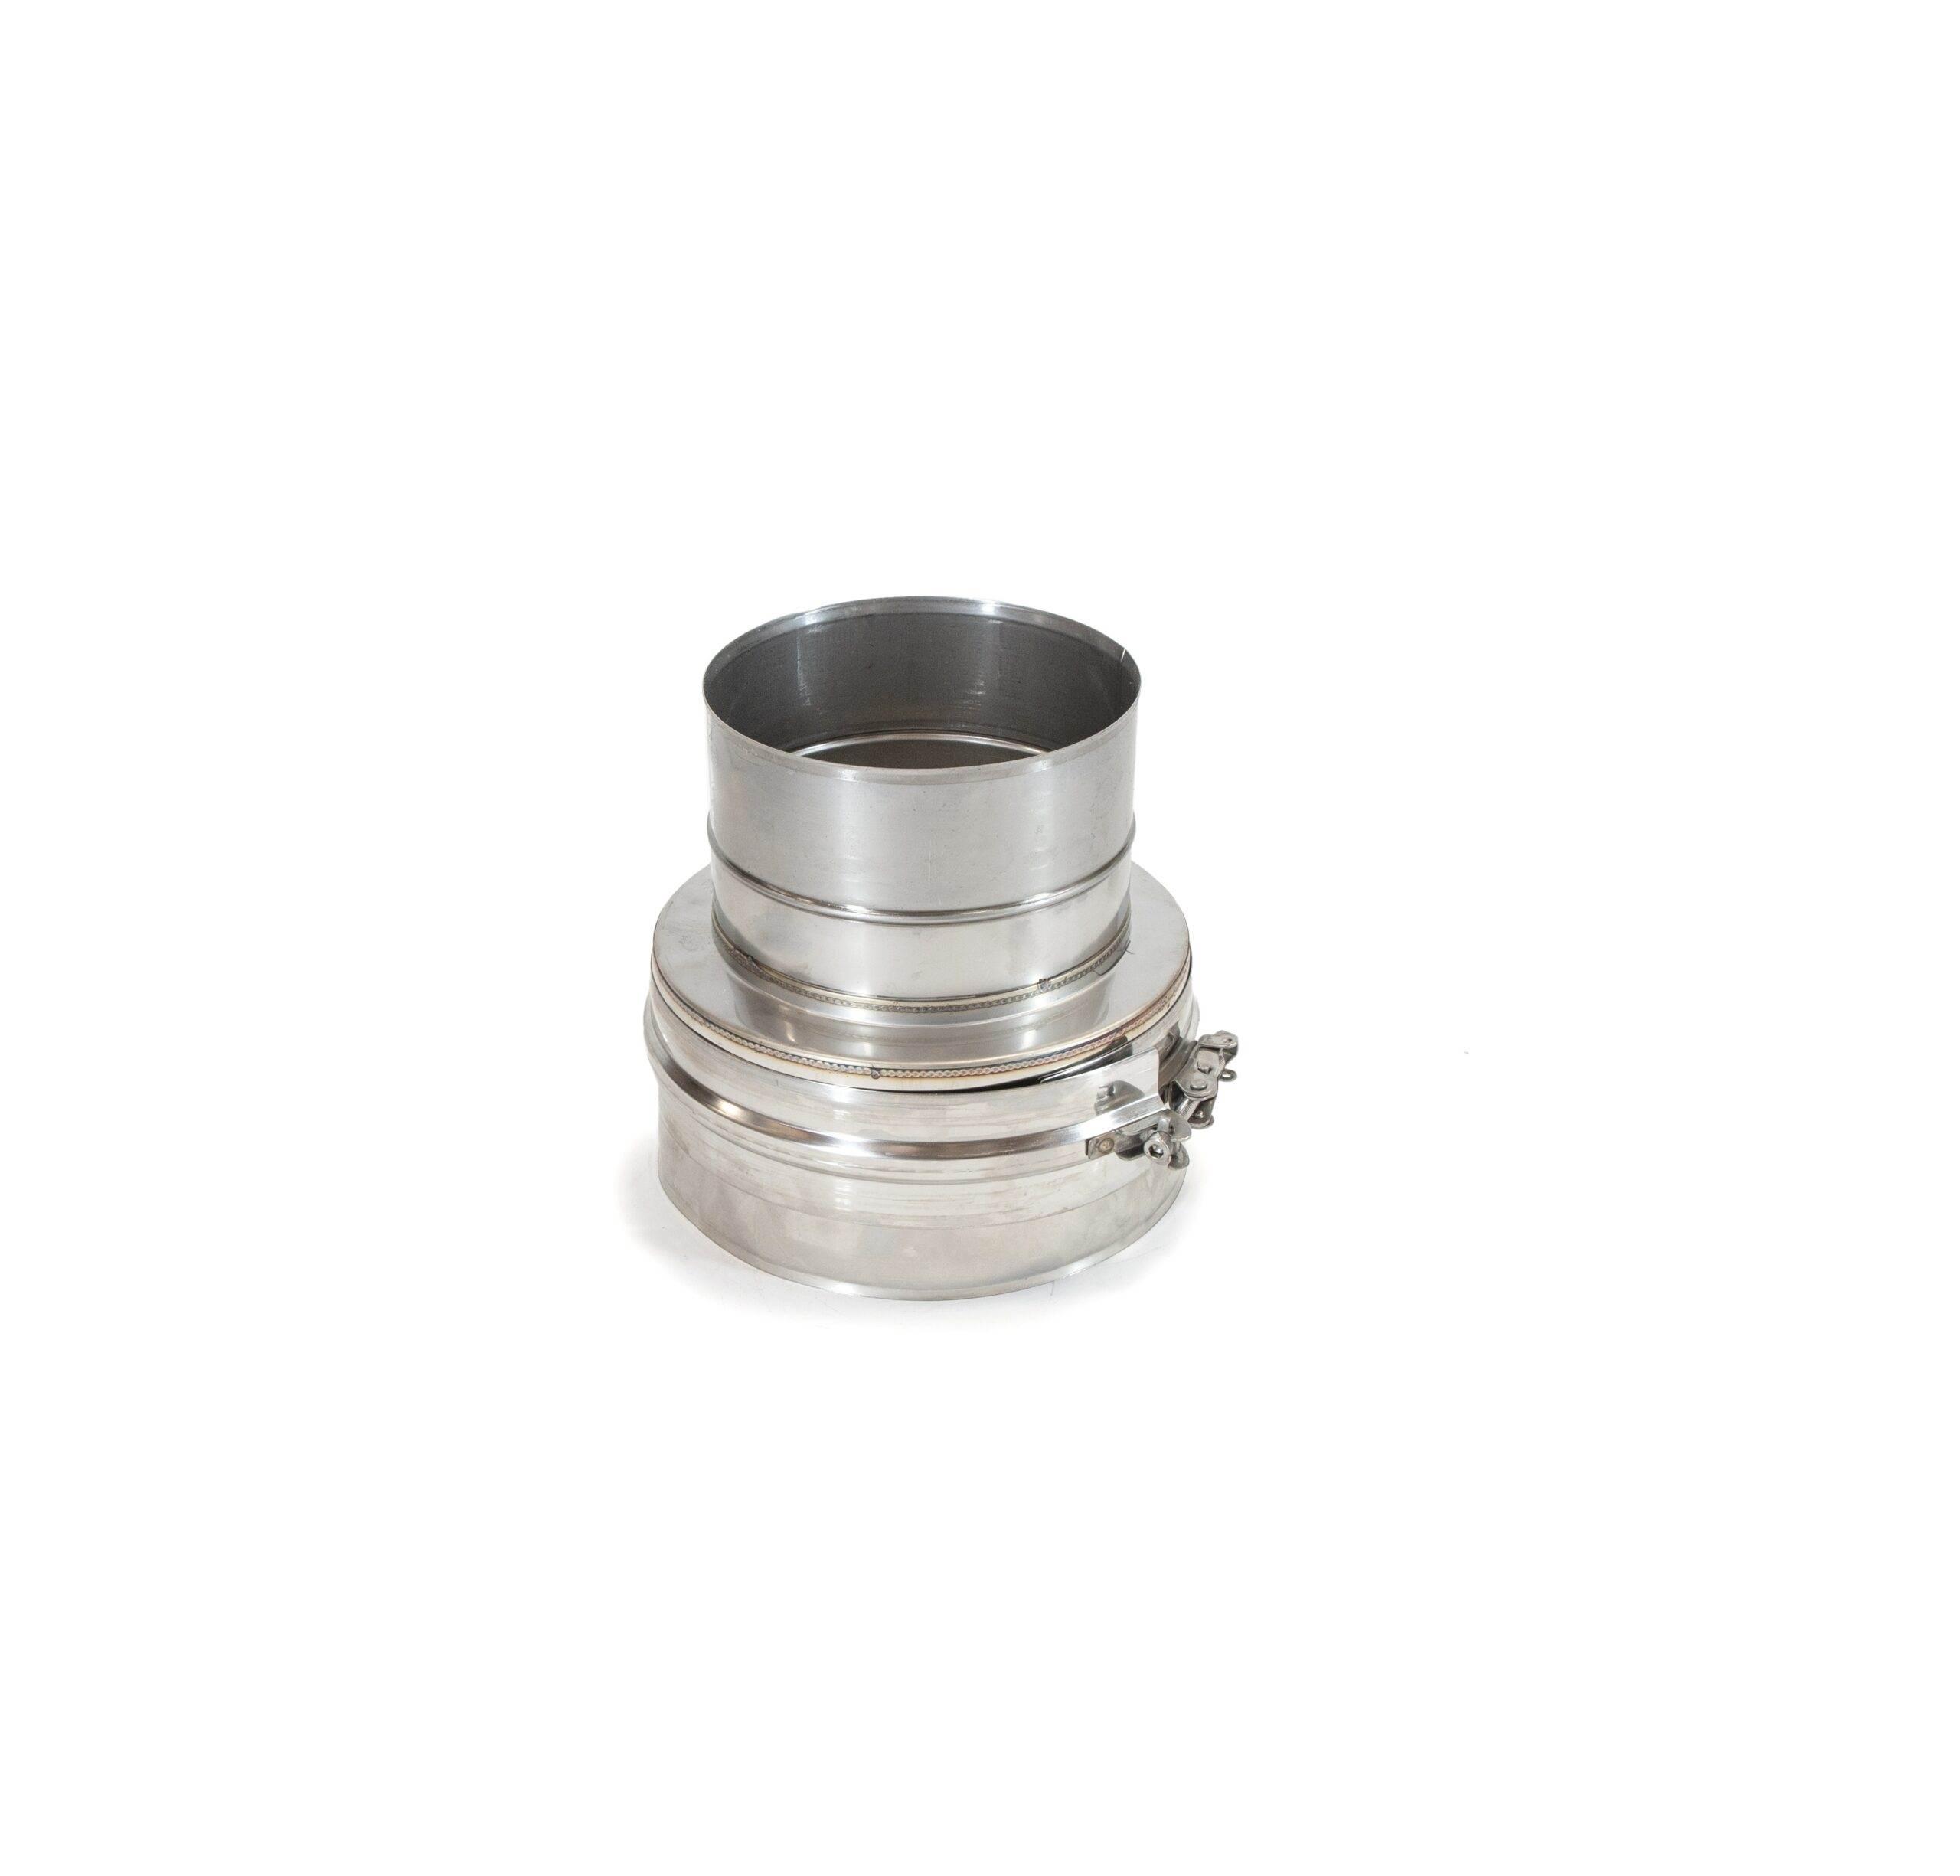 Insulated Chimney System J2179 ICS to flex adaptor